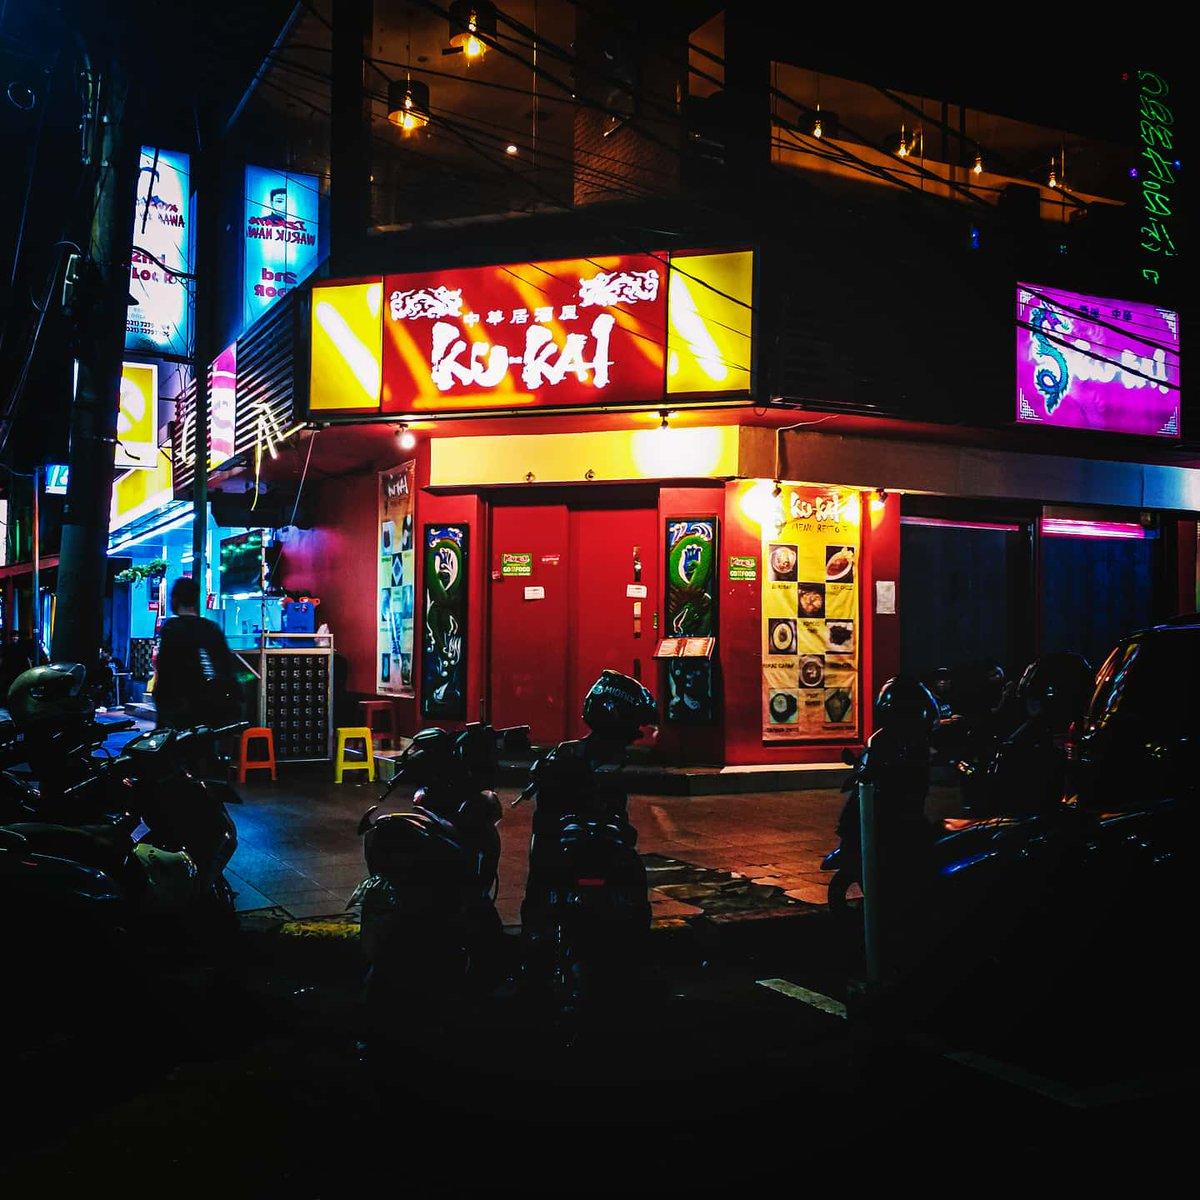 Suatu malam di pojok kota . . . . . #withgalaxy #samsung @samsungID #darkphotos #lightphotography #neonsigns #darktone #night_shooterz #potopotokota #nyebar_blokm #streetgrammer #visualgrams #arttherapy #citylab #cityframe #lightbox #cityview #citykillerz #citygrammers pic.twitter.com/b9eOZhOSSw